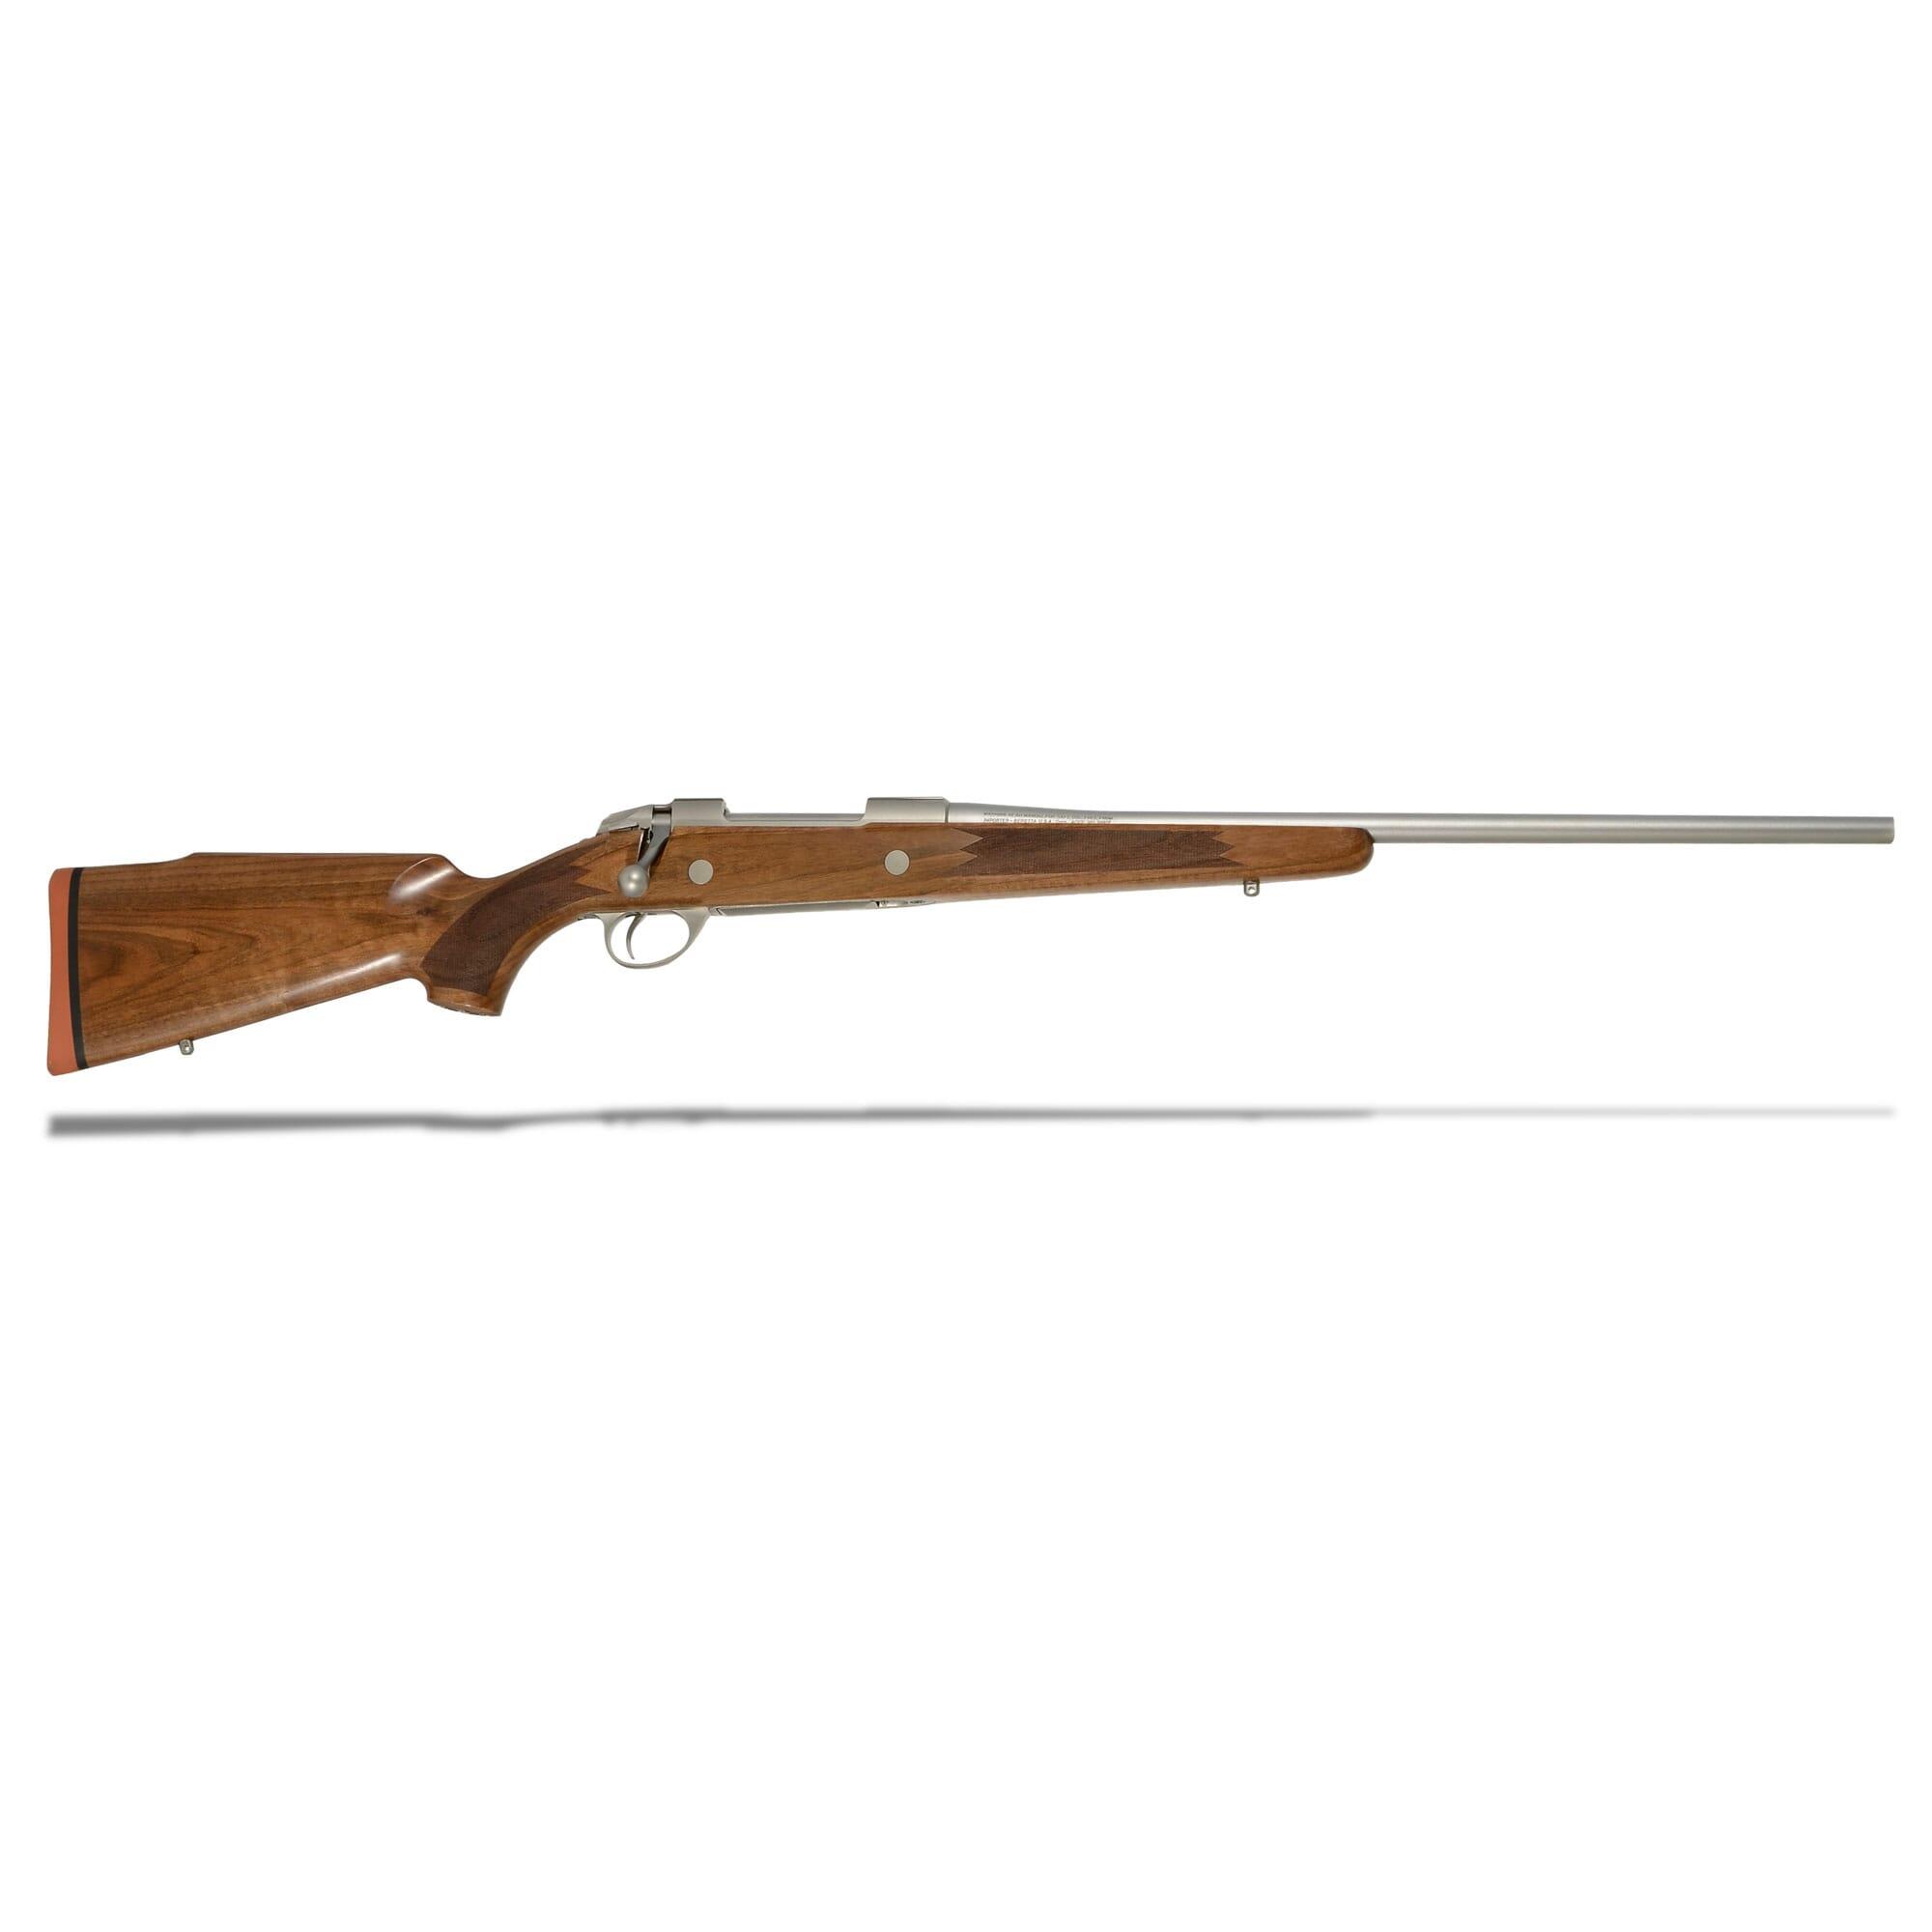 Sako Stainless Hunter .270 Win. Rifle JRS1H18